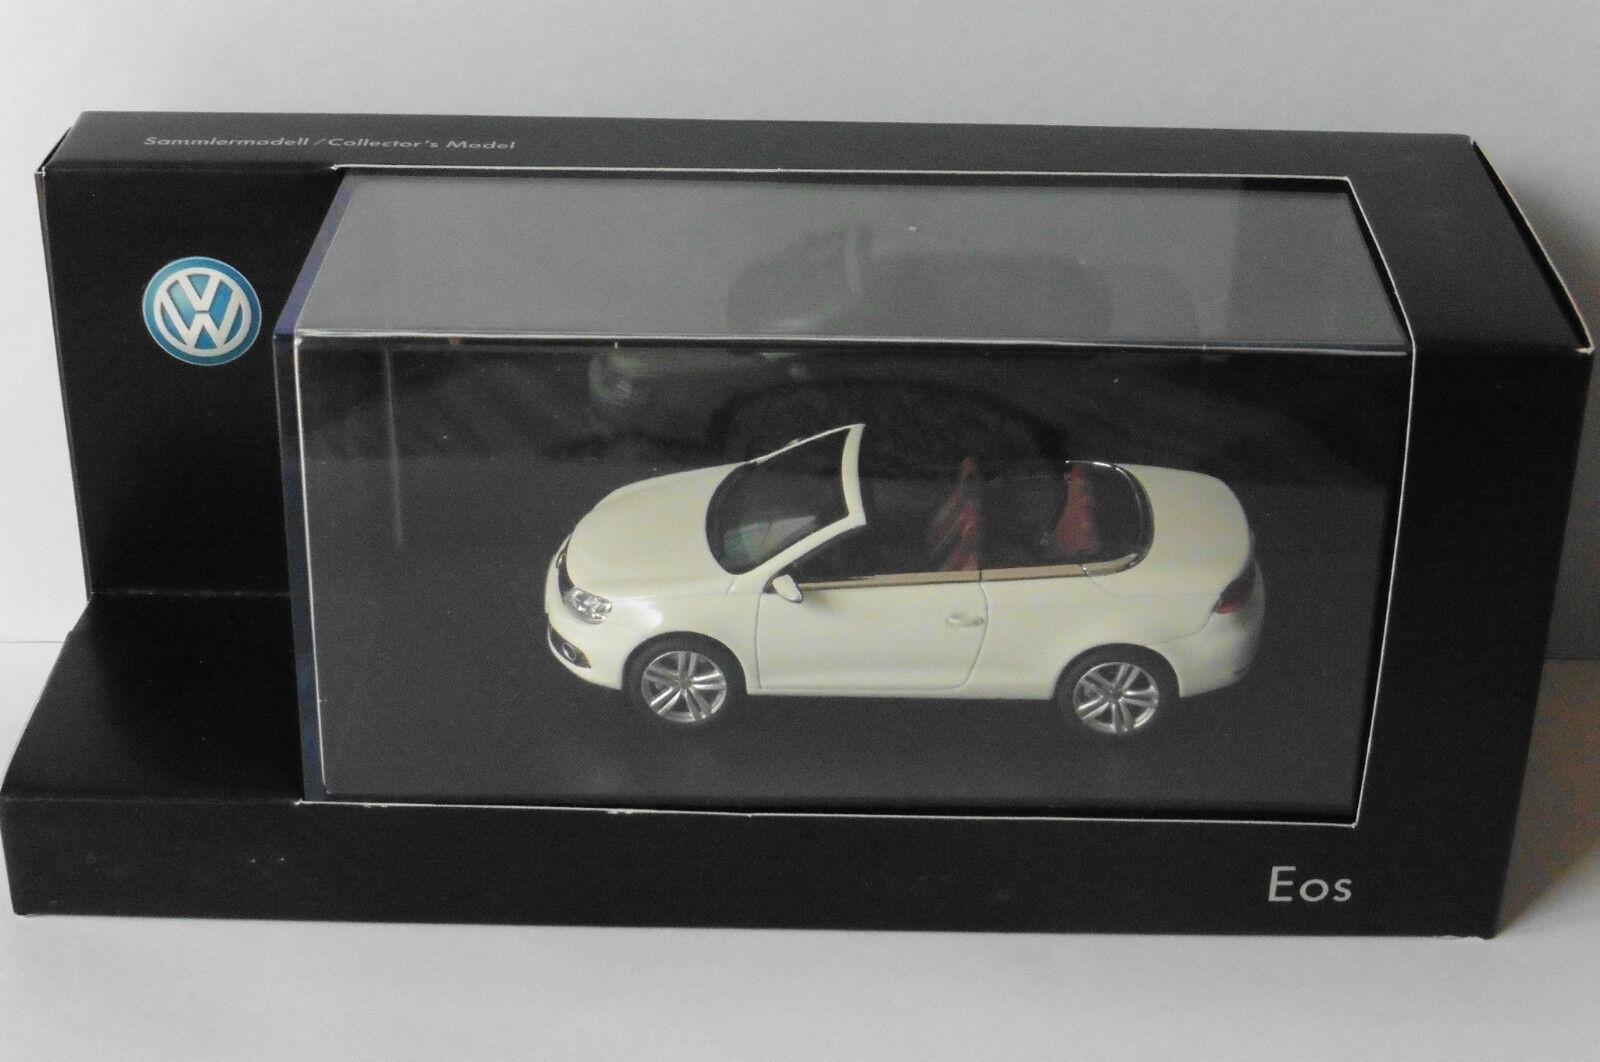 VW VOLKSWAGEN EOS CABRIOLET 2012 blanc KYOSHO 1Q1099300B9A 1 43 WEISS blanc